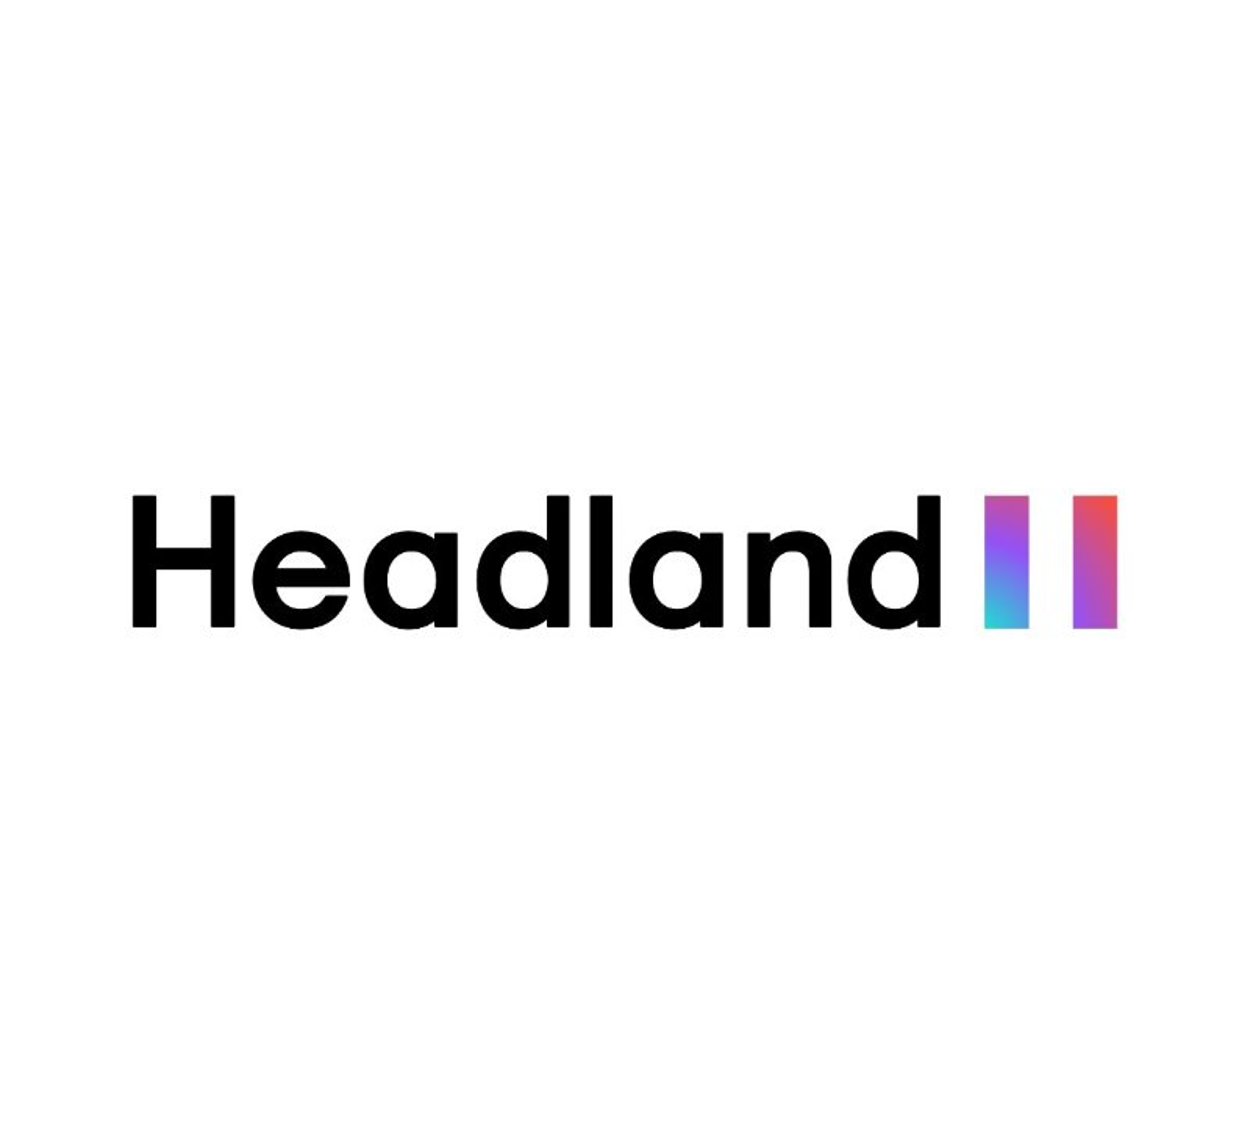 Headland.png